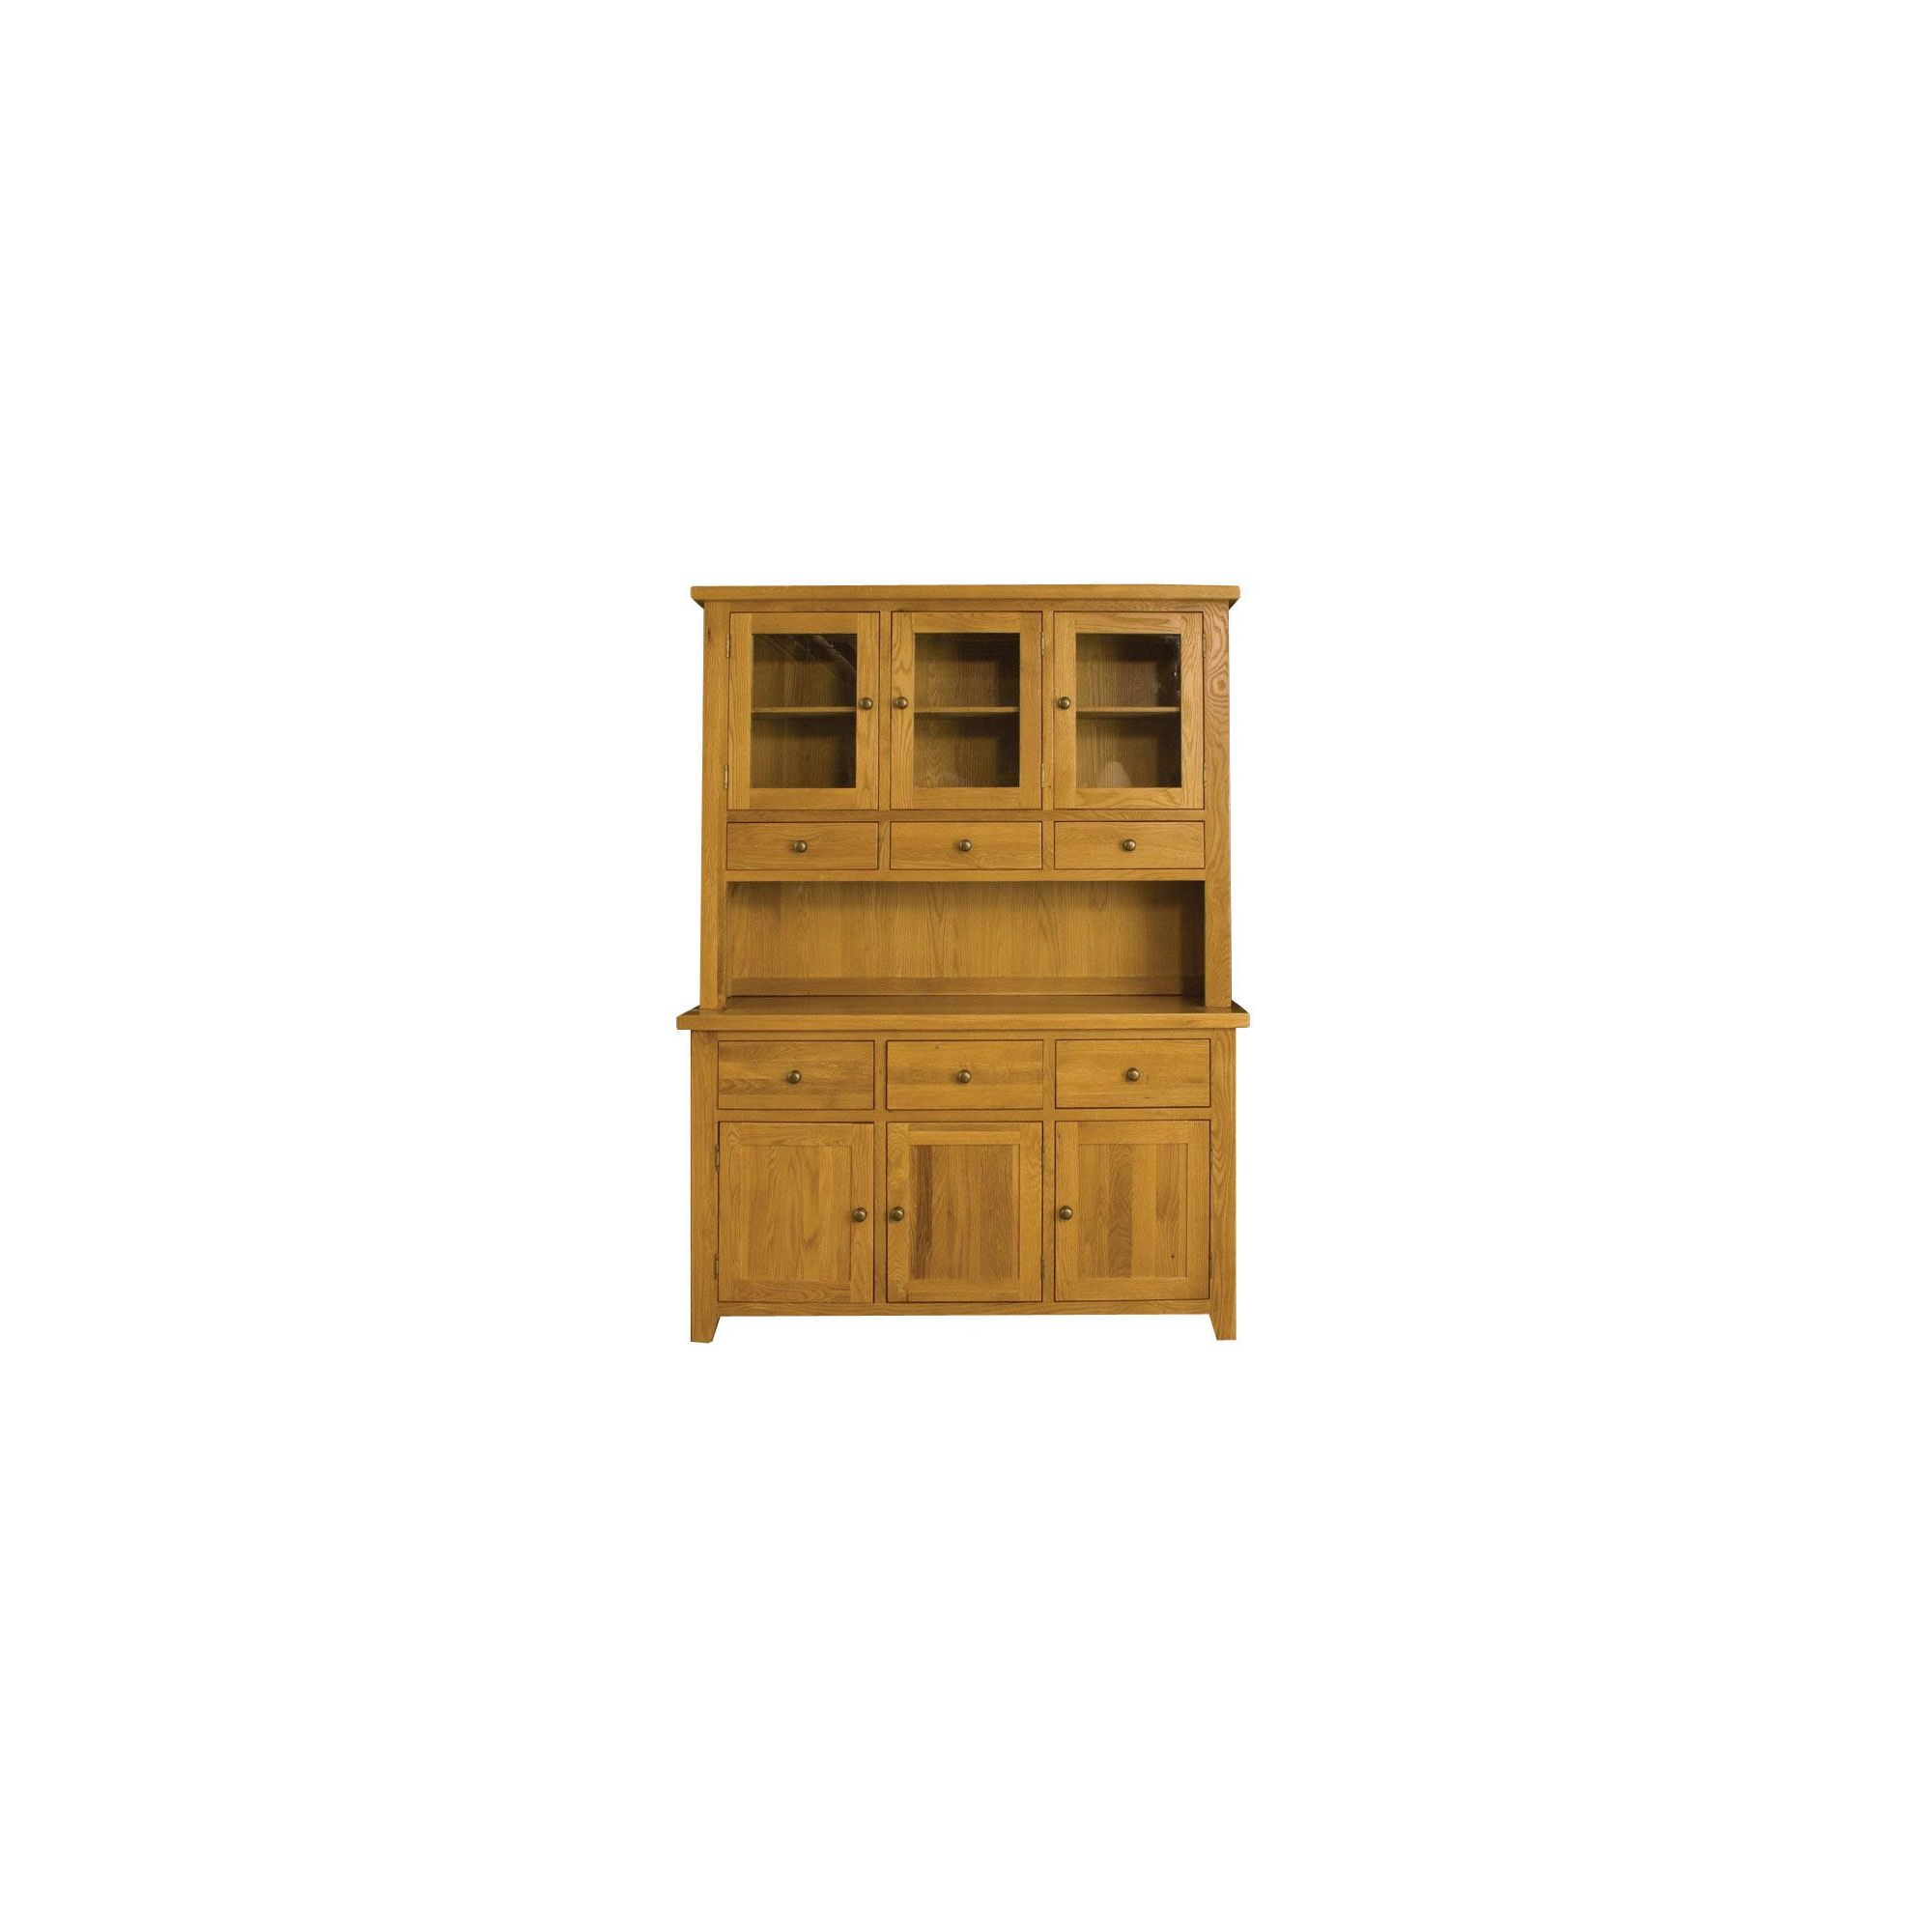 Alterton Furniture Michigan Dresser at Tesco Direct